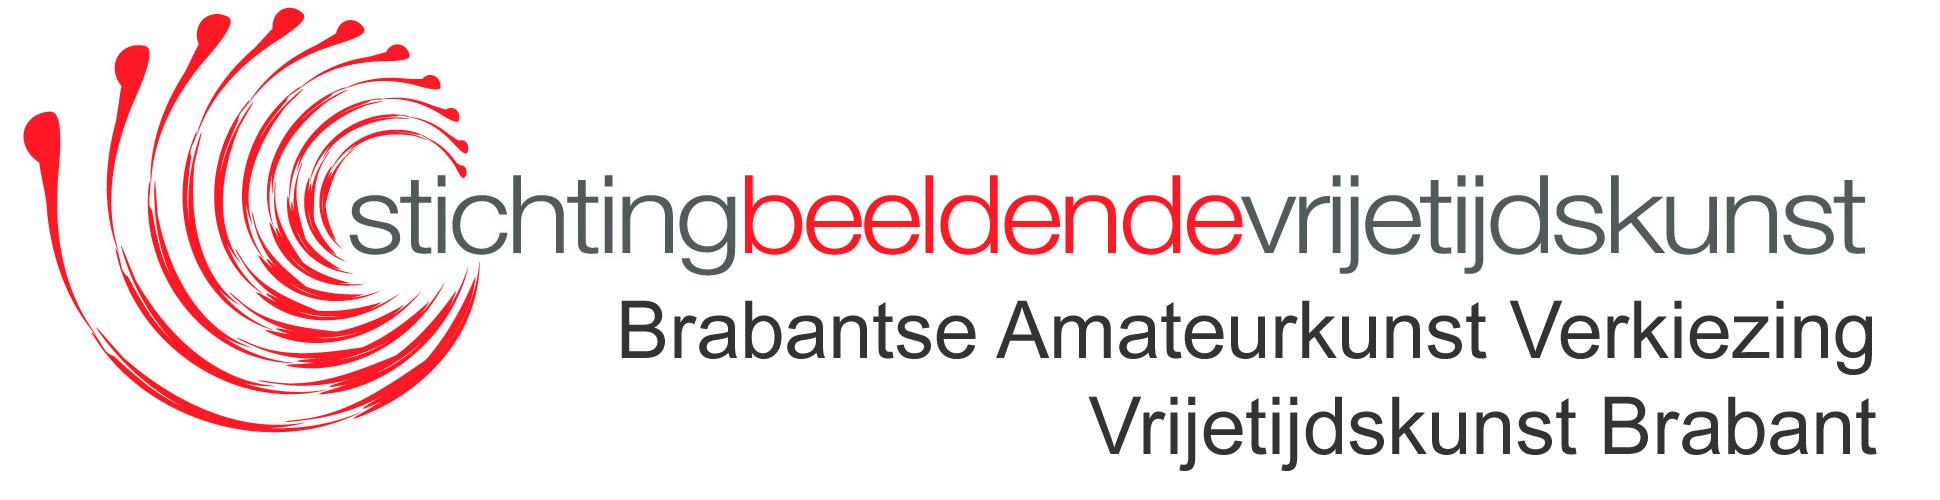 Stichting Beeldende Vrijetijdskunst (SBV) Brabant